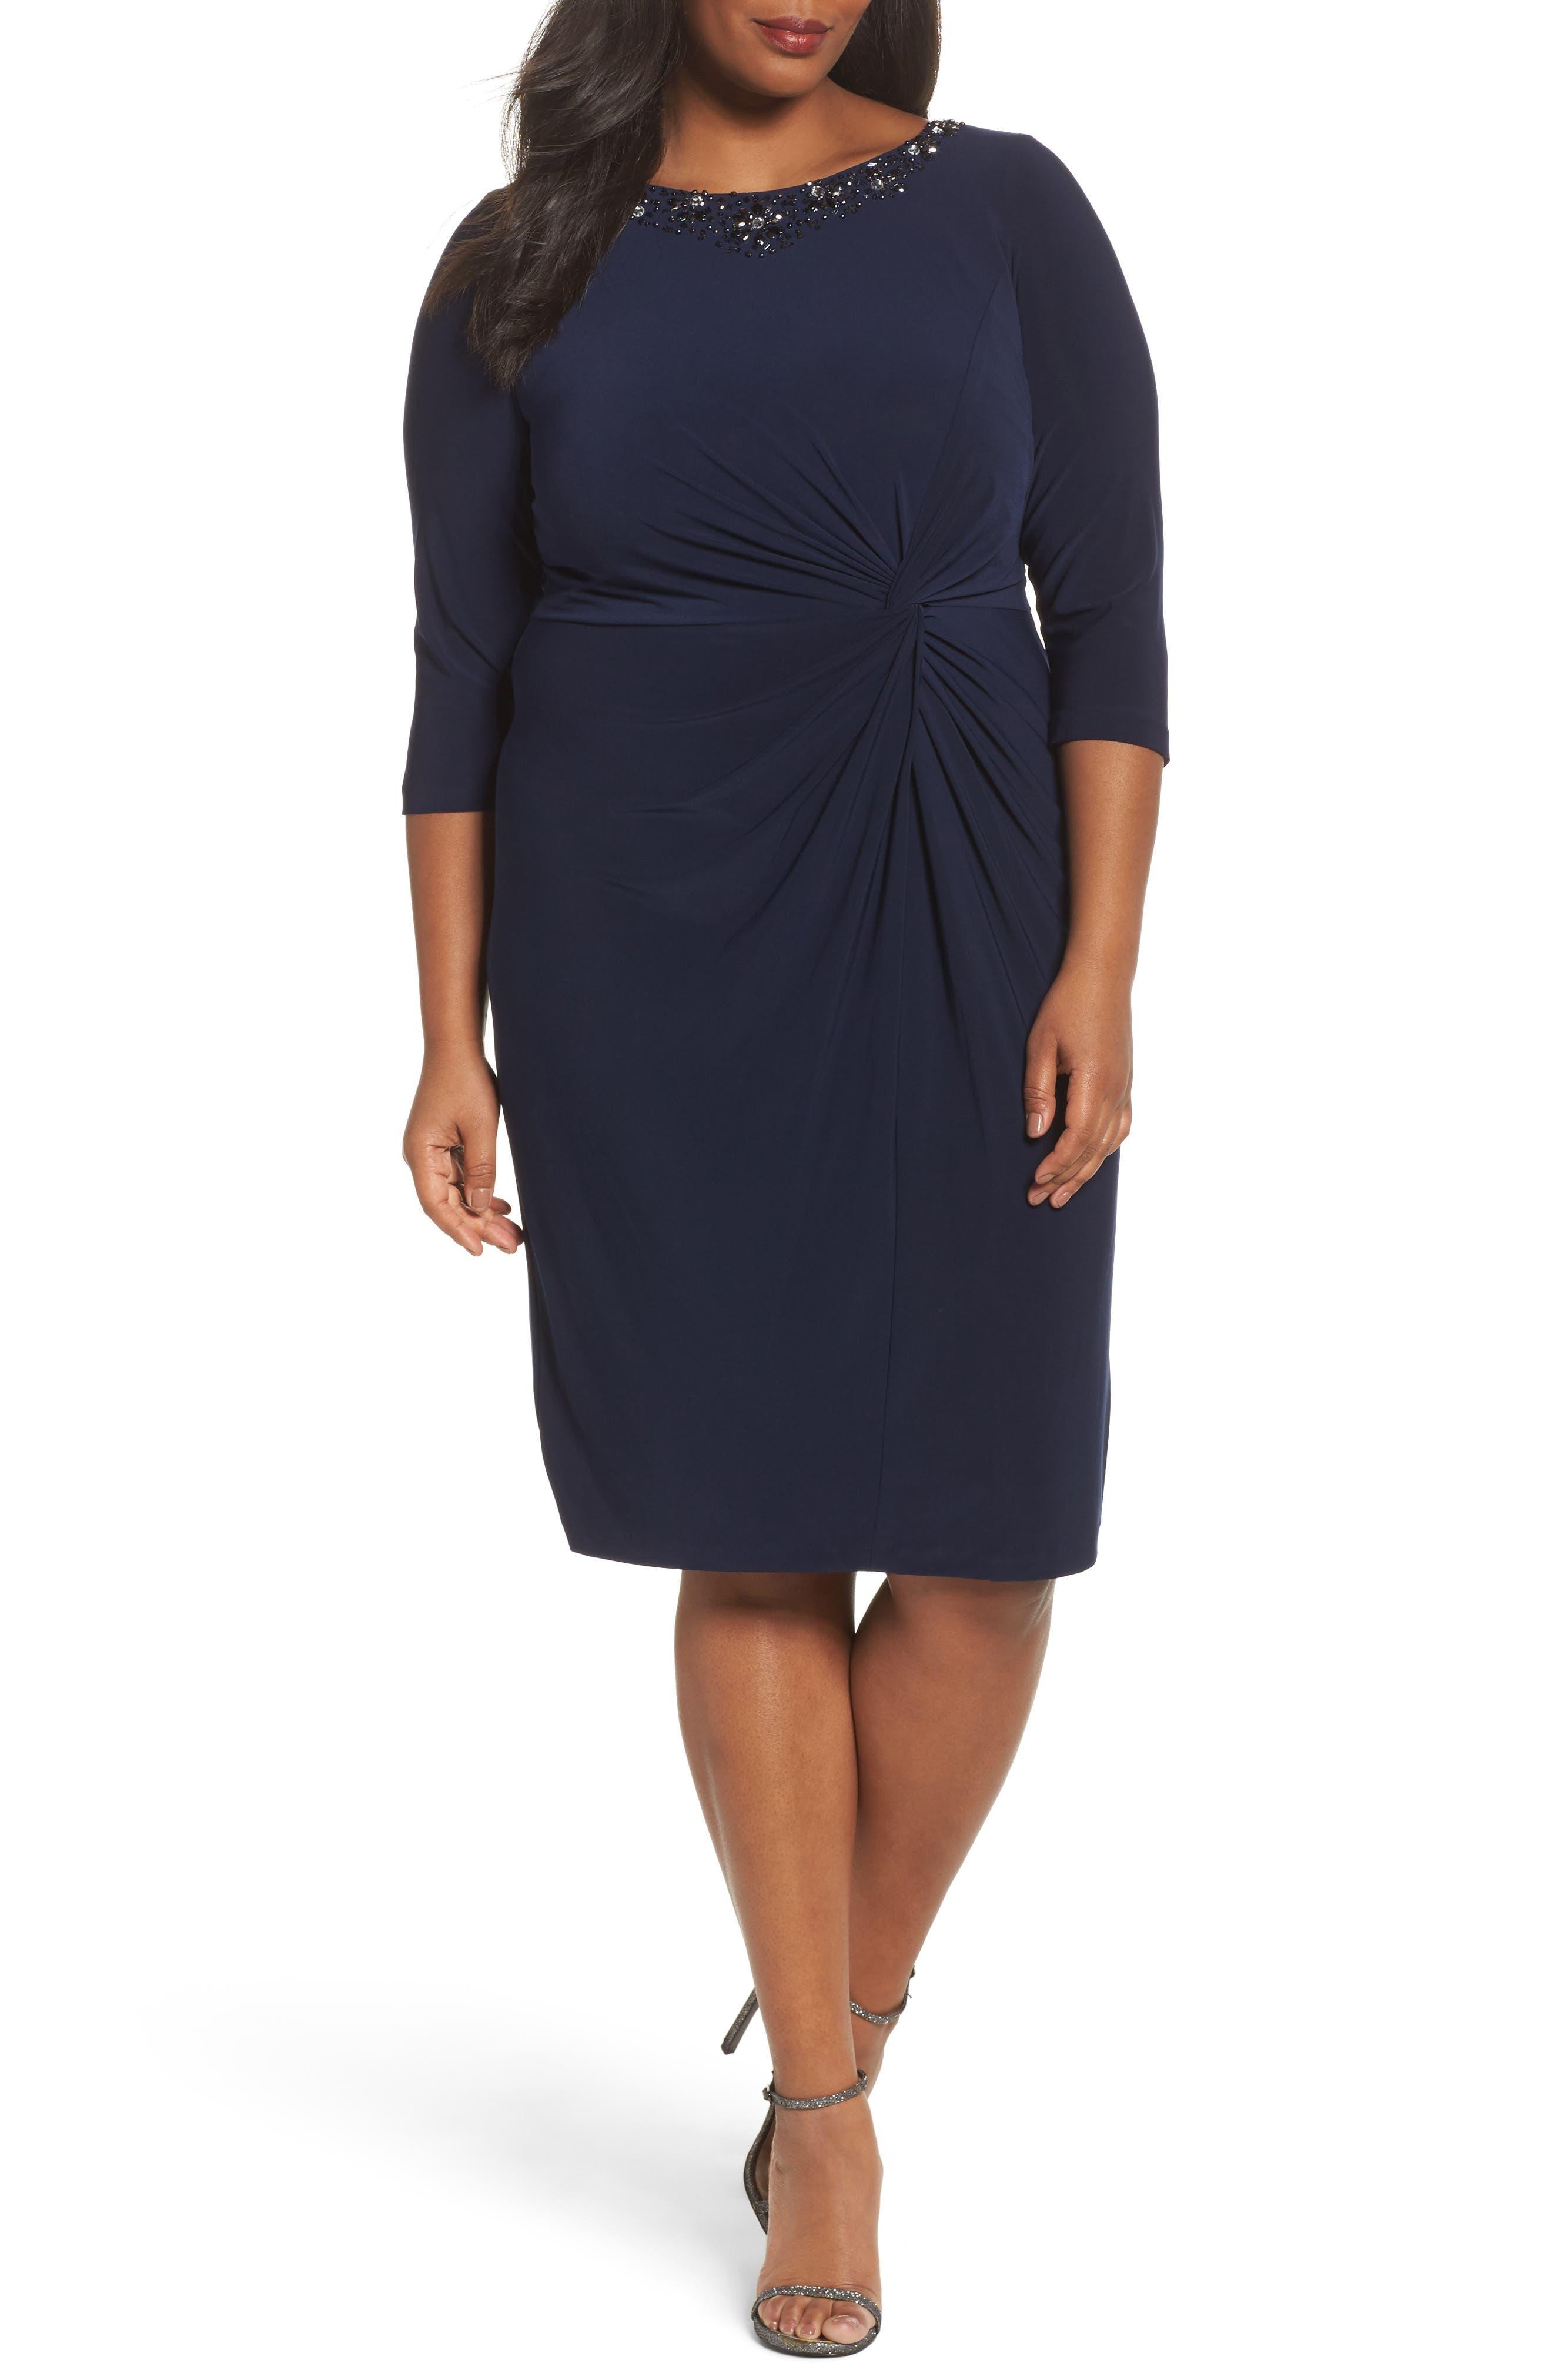 Alternate Image 1 Selected - Alex Evenings Jewel Neck Twist Front Shift Dress (Plus Size)